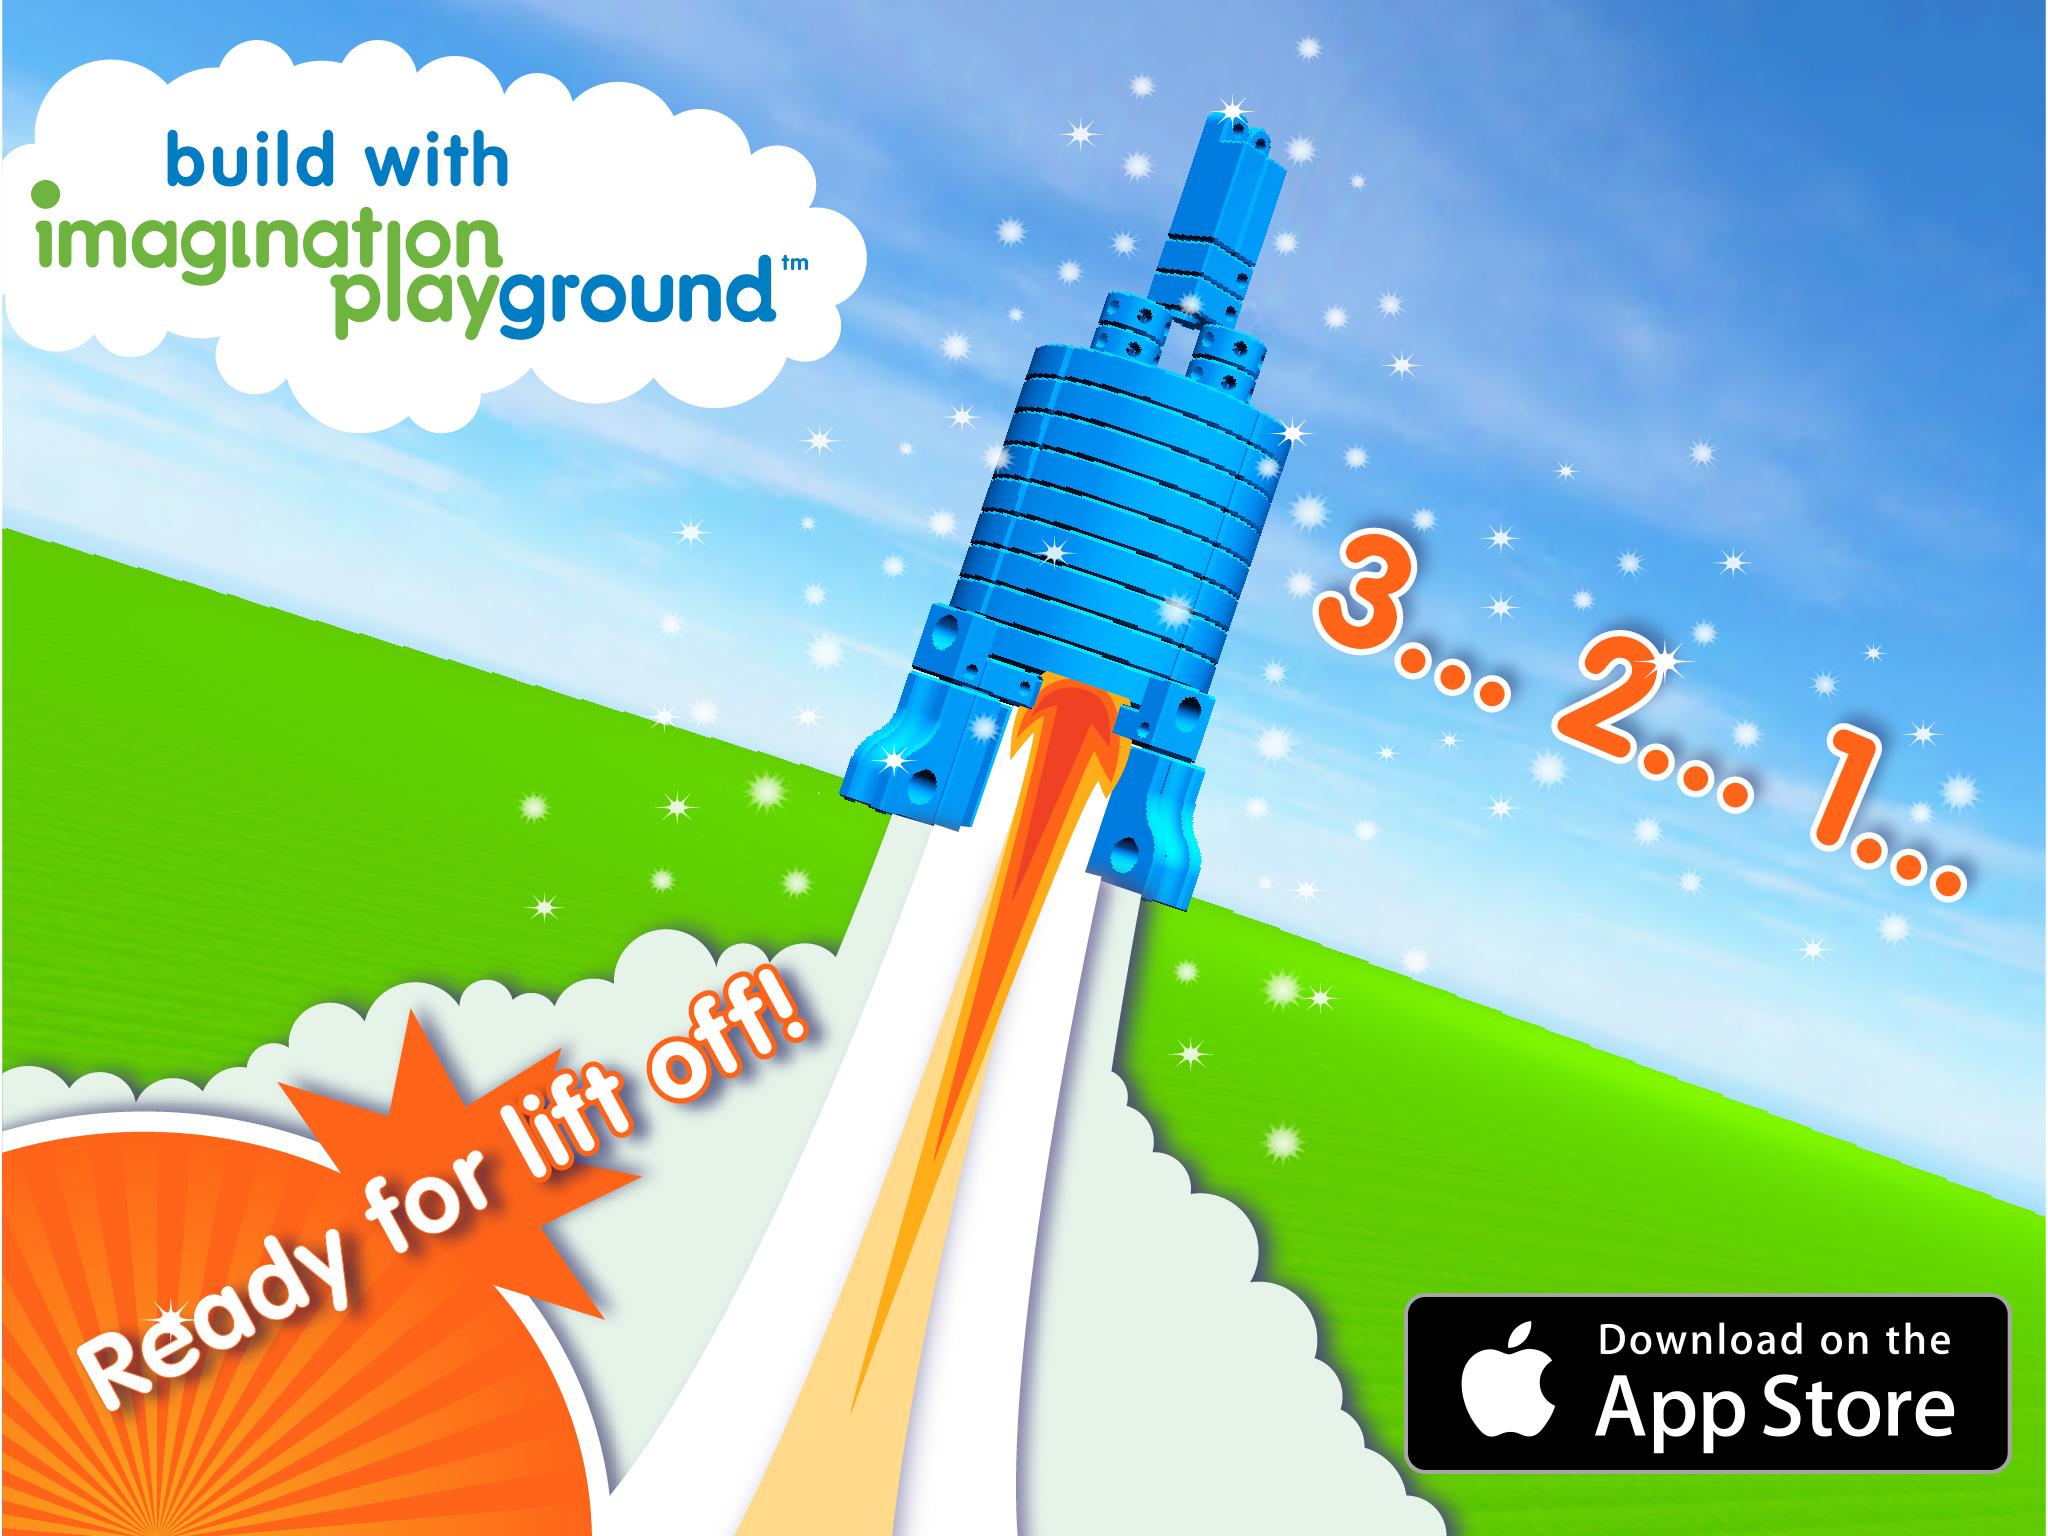 Imagination Playground Announces Launch Of 3d Builder App